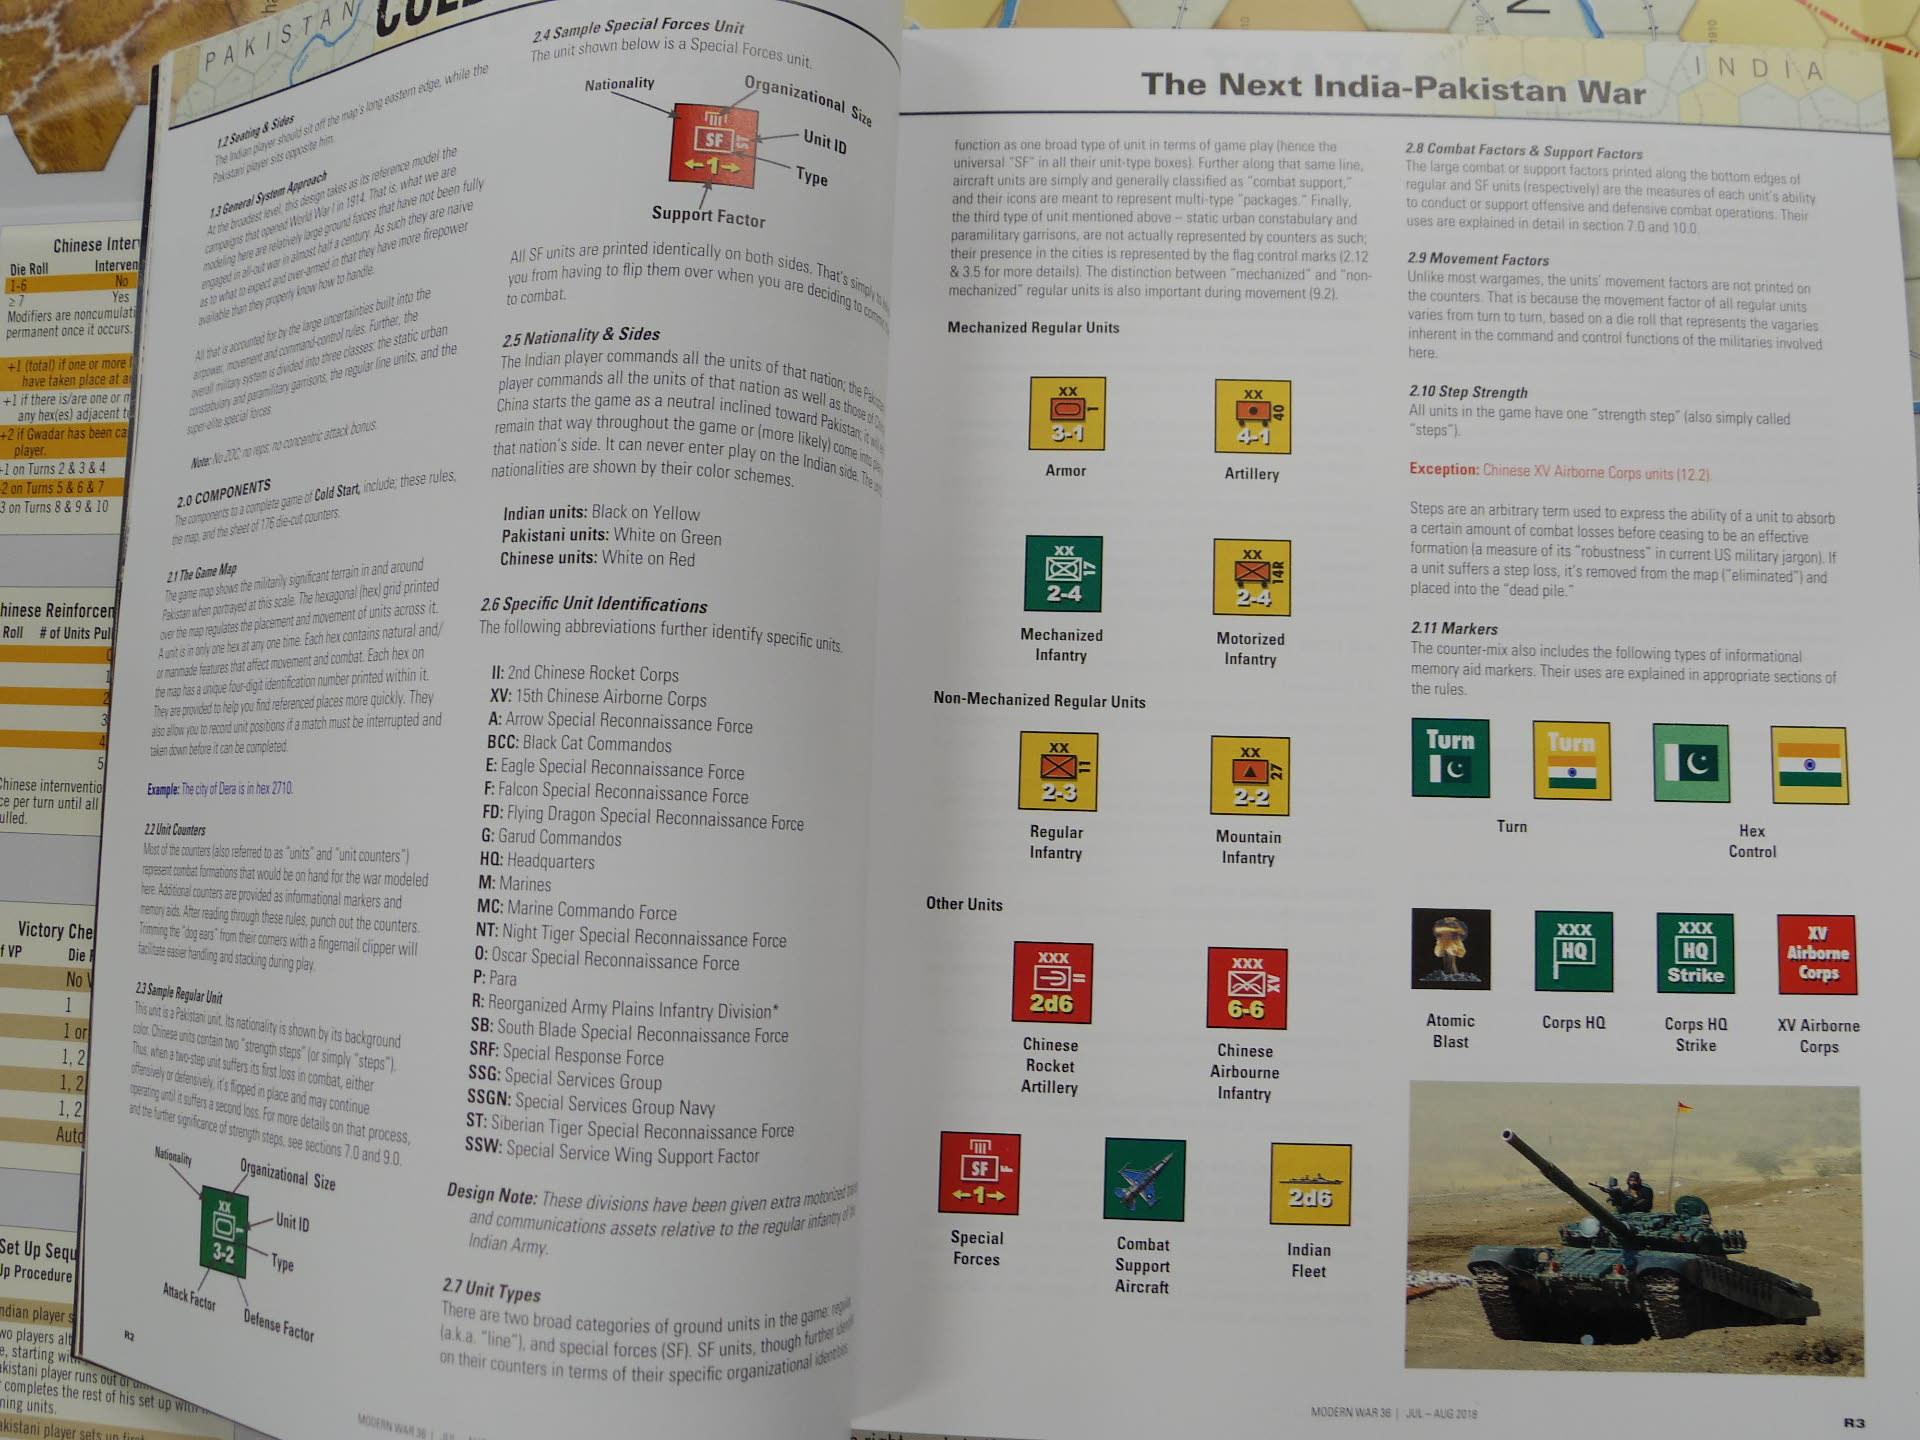 Modern War誌#36 Cold Start: The Next India-Pakistan War... 2018.06.17(日)YSGA第348回定例会に持ち寄られ_b0173672_23113423.jpg